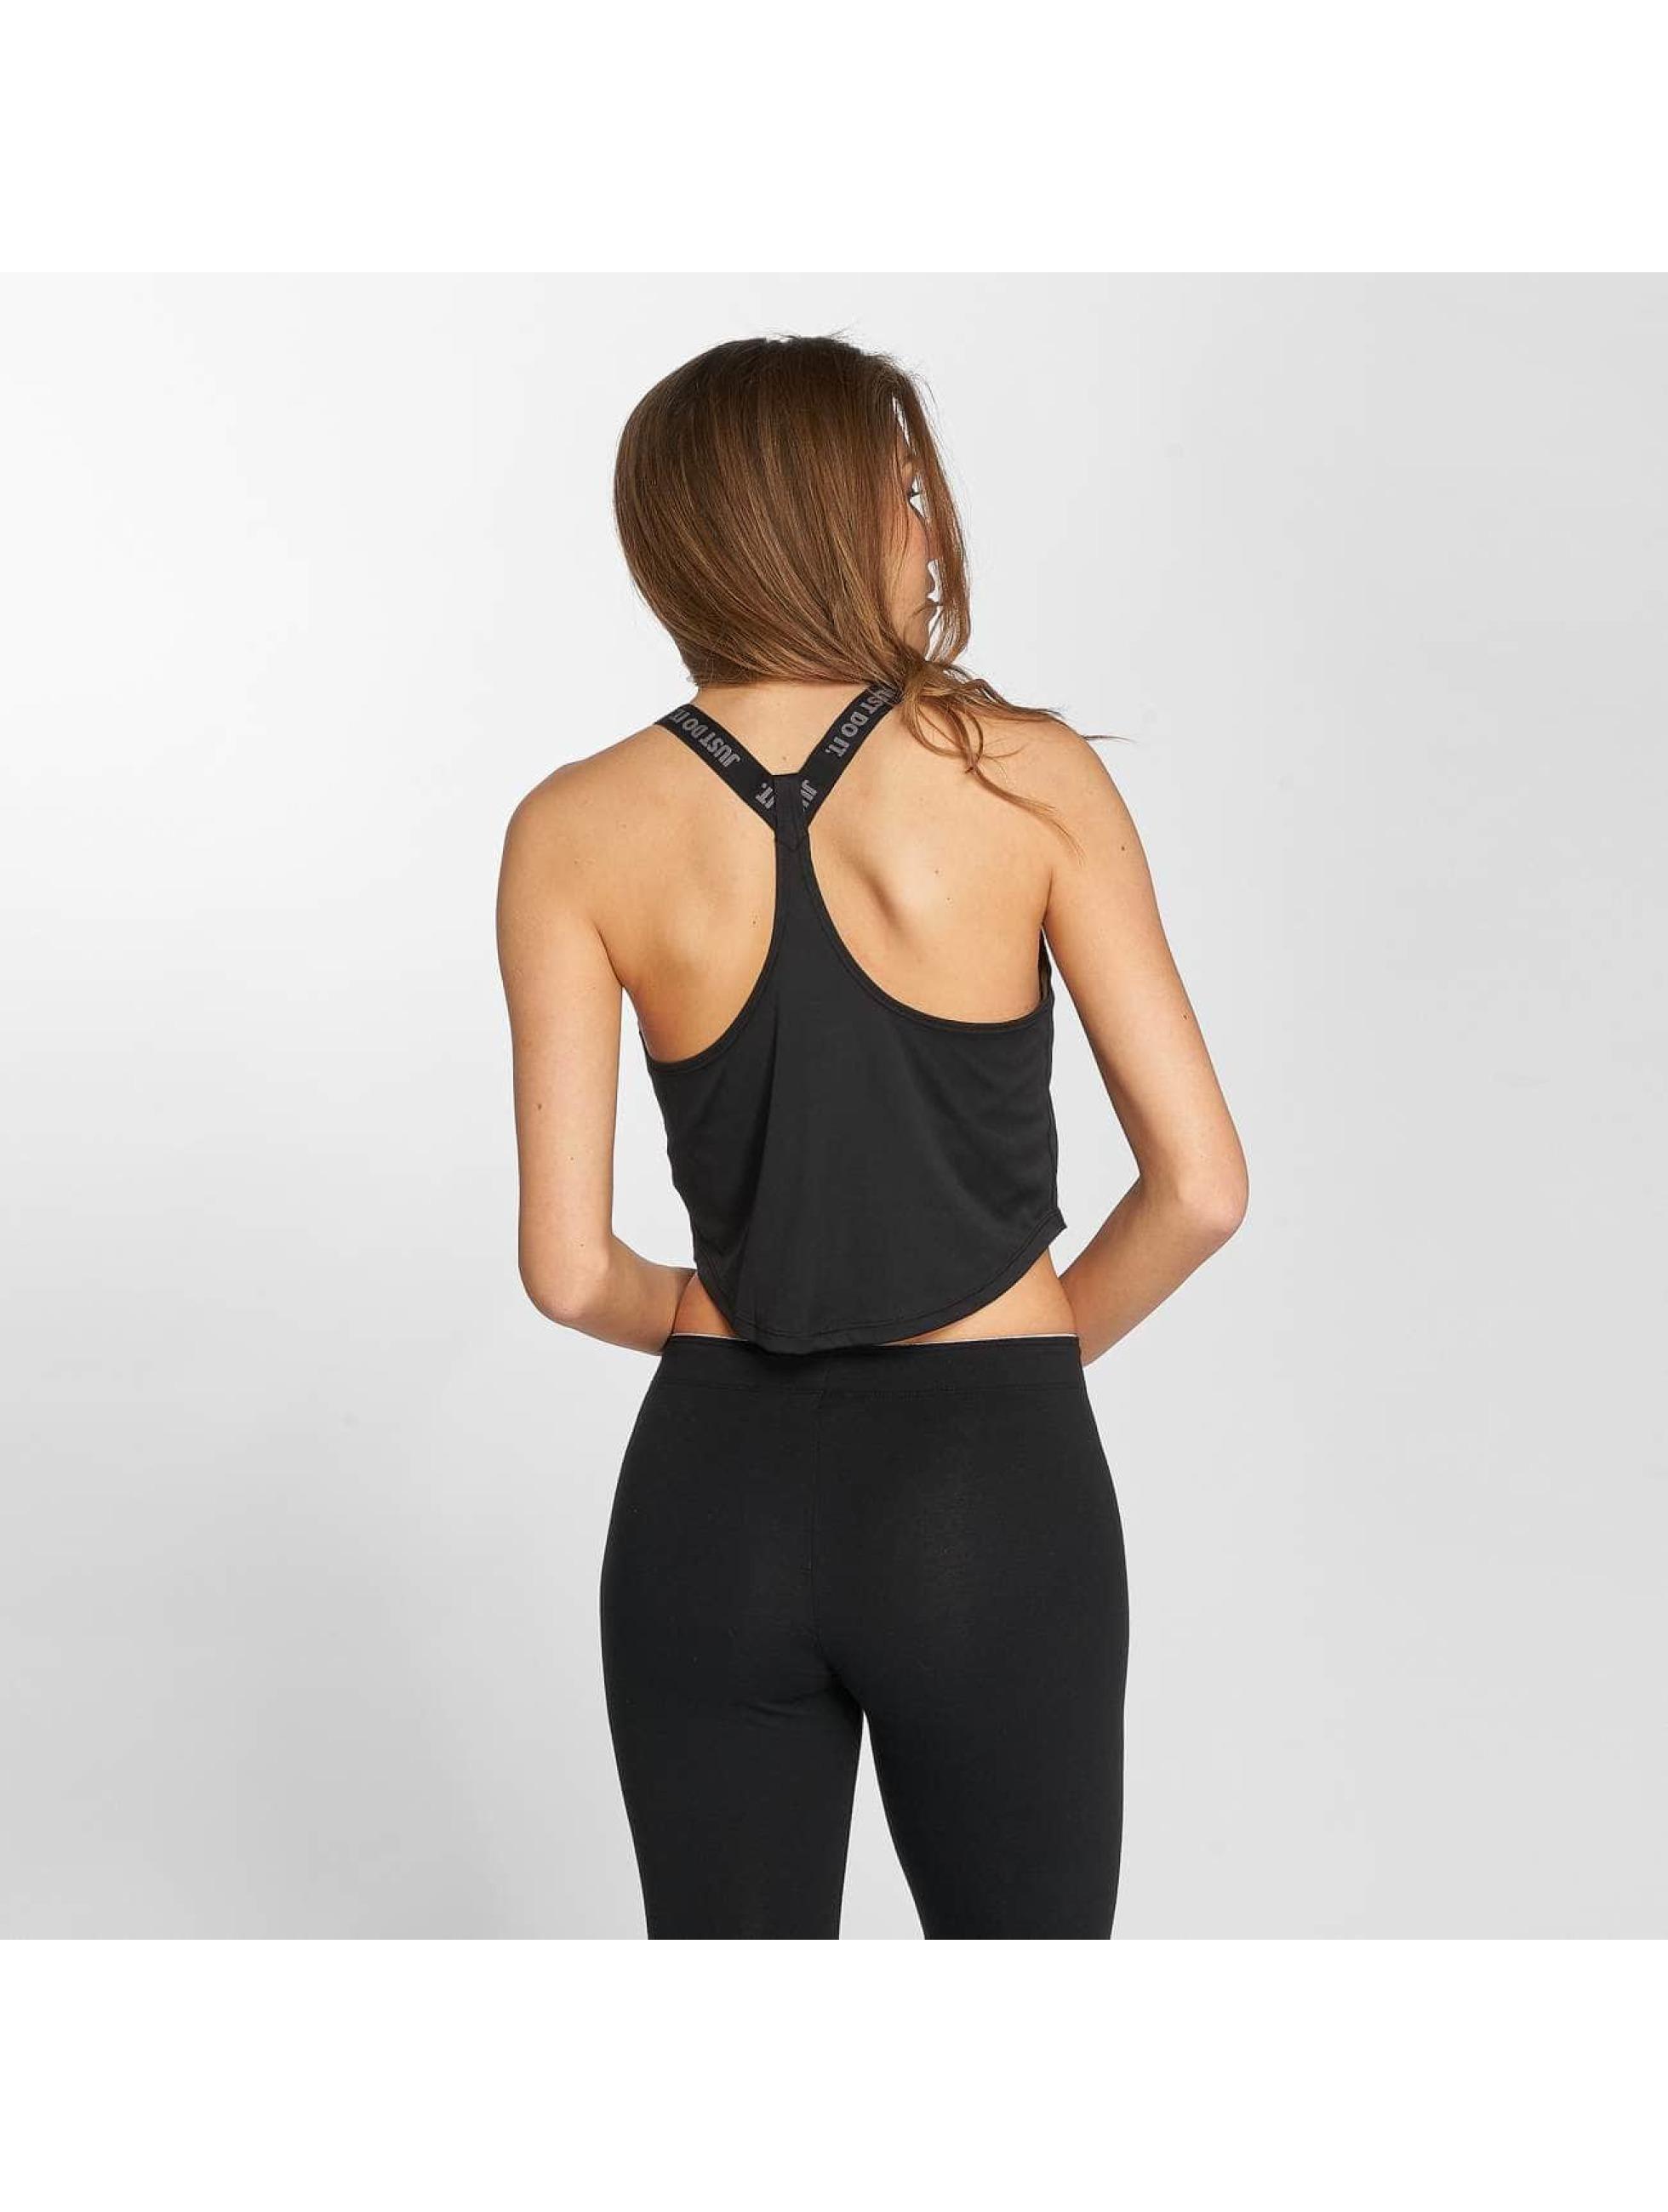 Nike Performance top Dry Top zwart